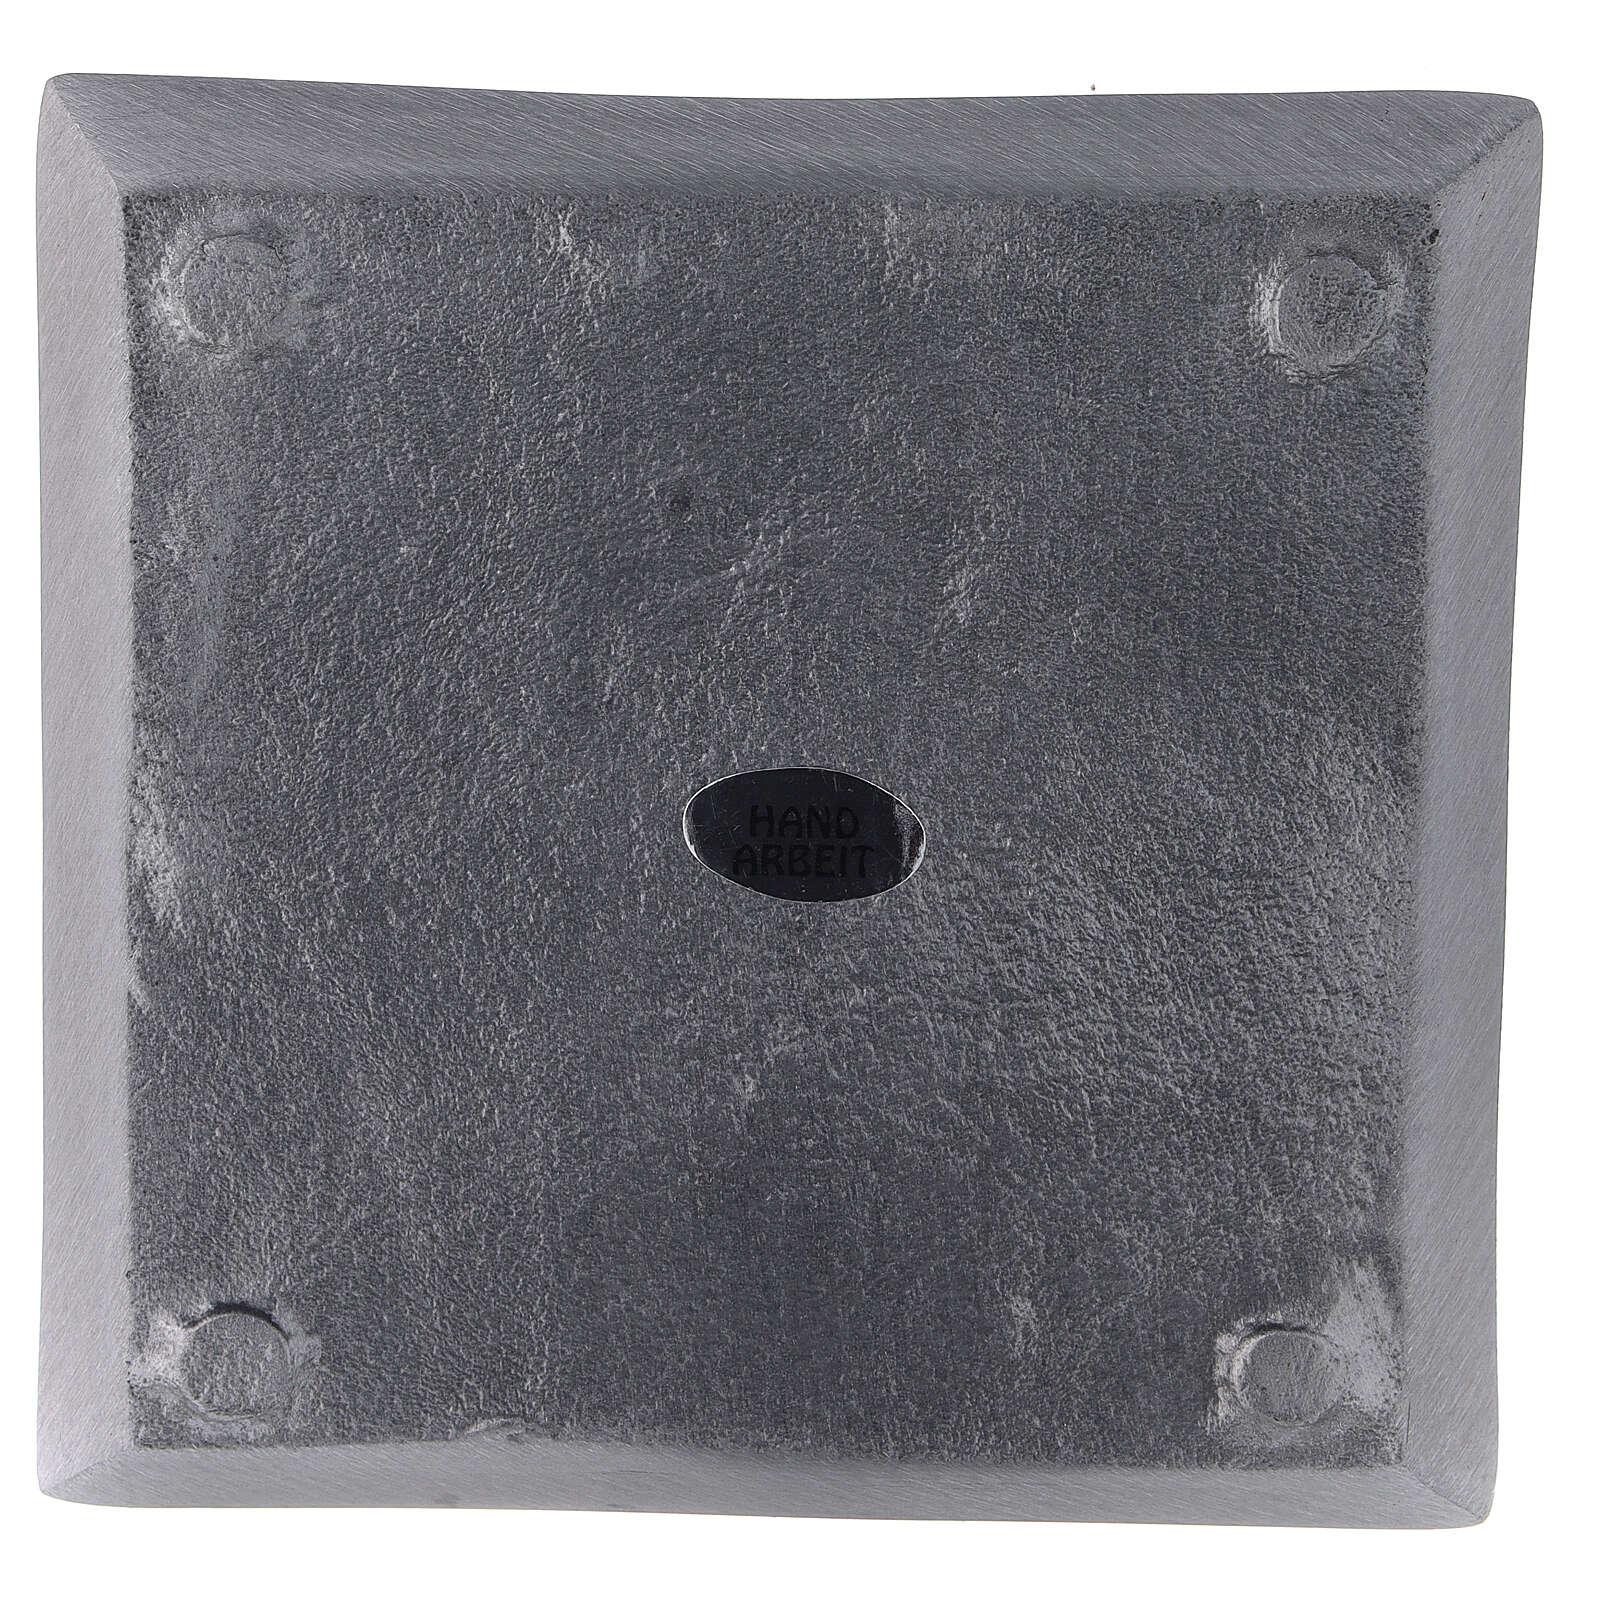 Plato portavela cuadrado aluminio satinado 11x11 cm 3